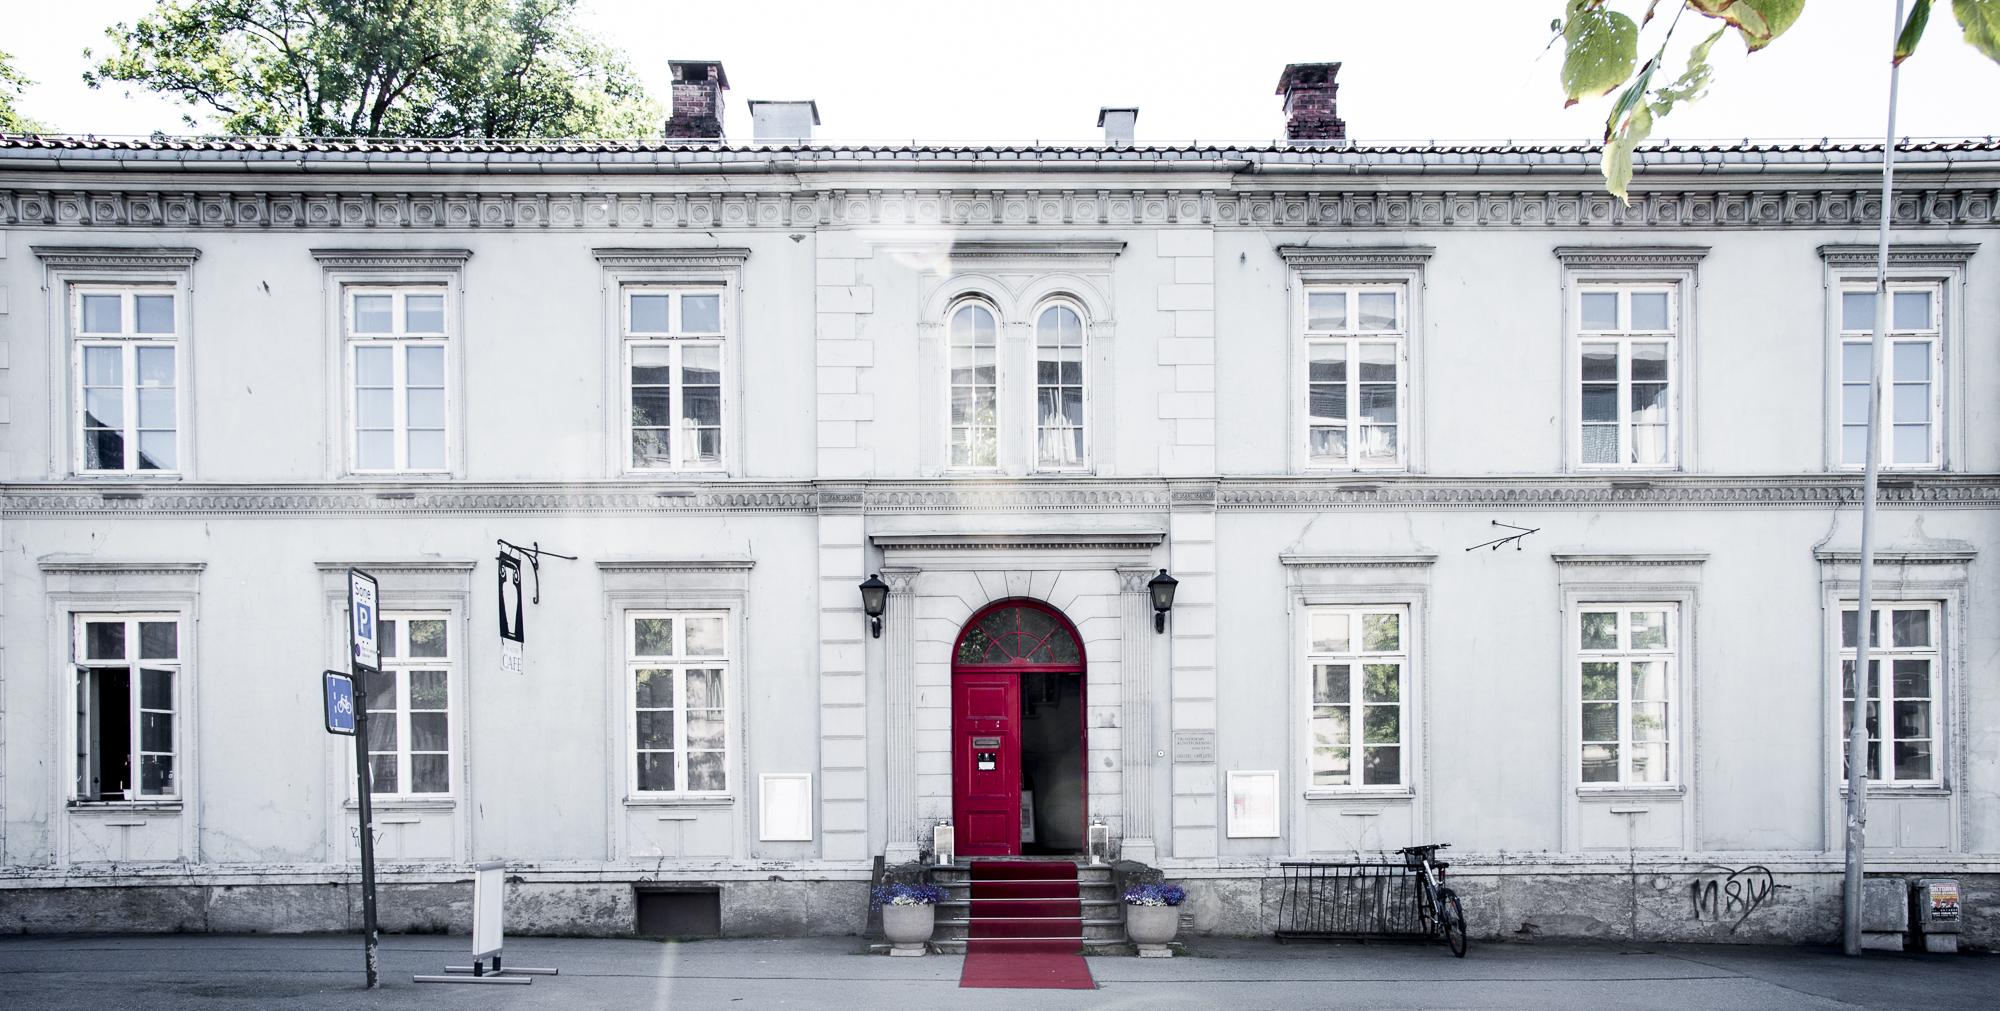 TKF_facade_DianaLindbjerg_02_low